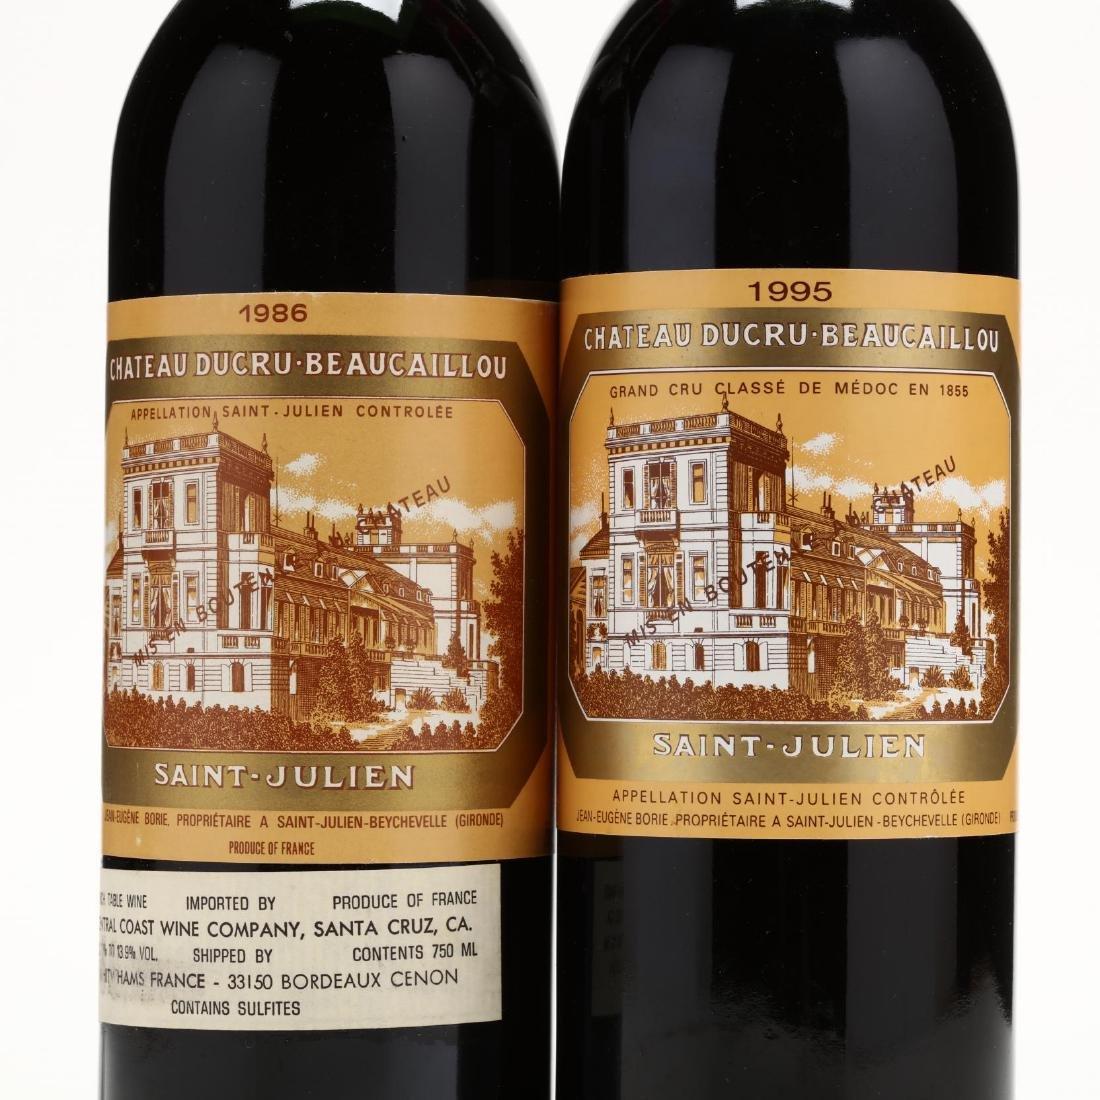 1986 & 1995 Chateau Ducru Beaucaillou - 2